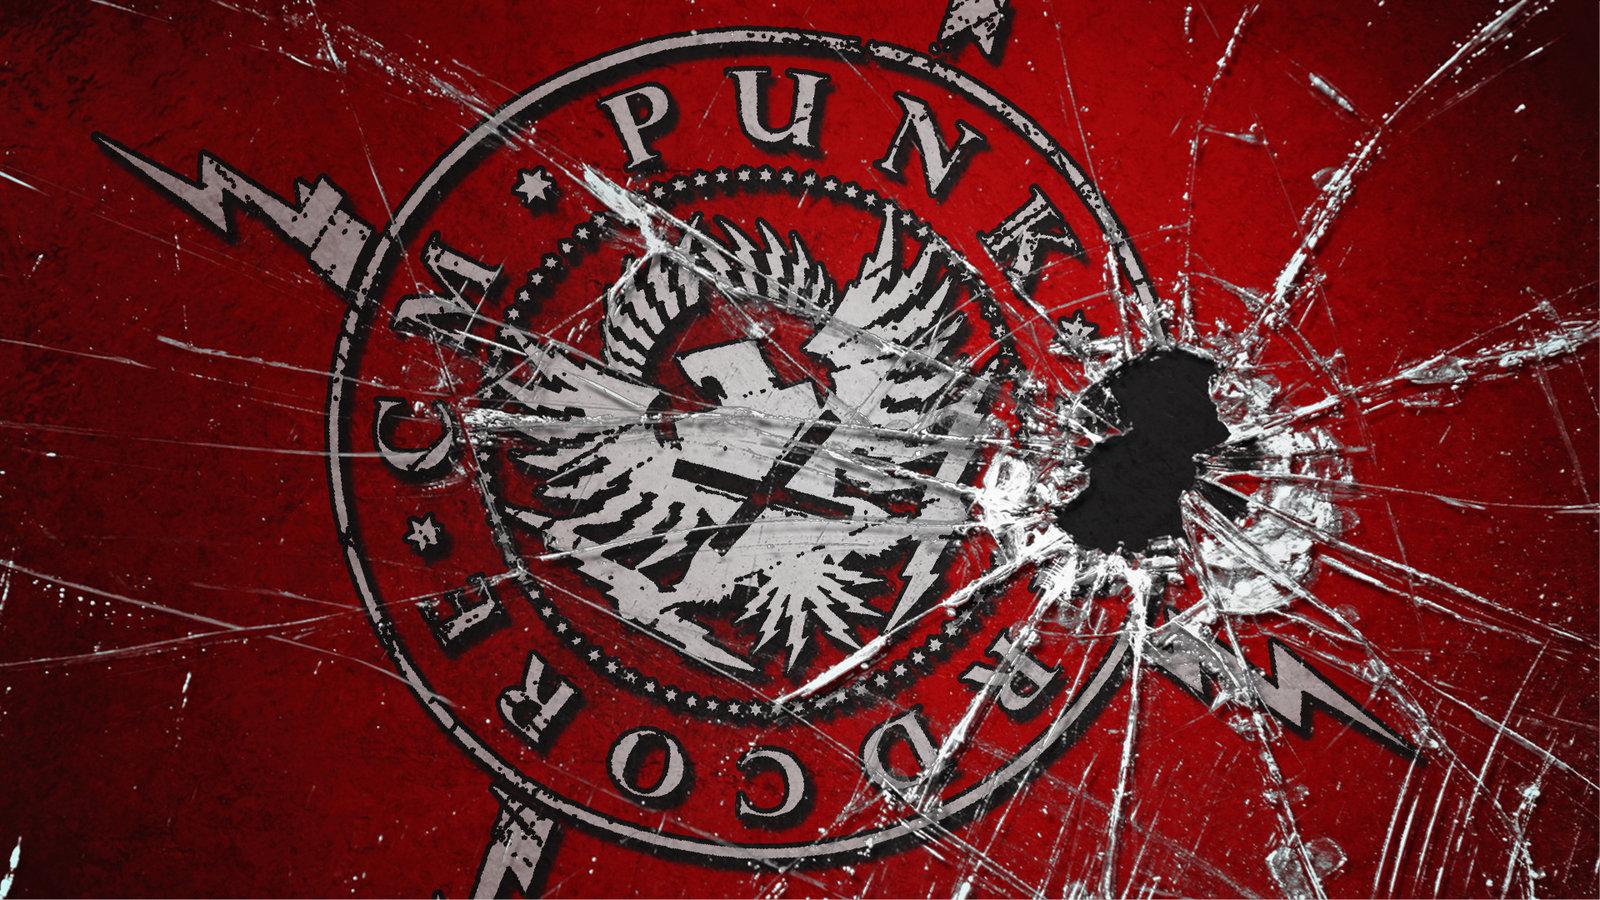 CM Punk Glass Wallpaper by 333x on deviantART 1600x900